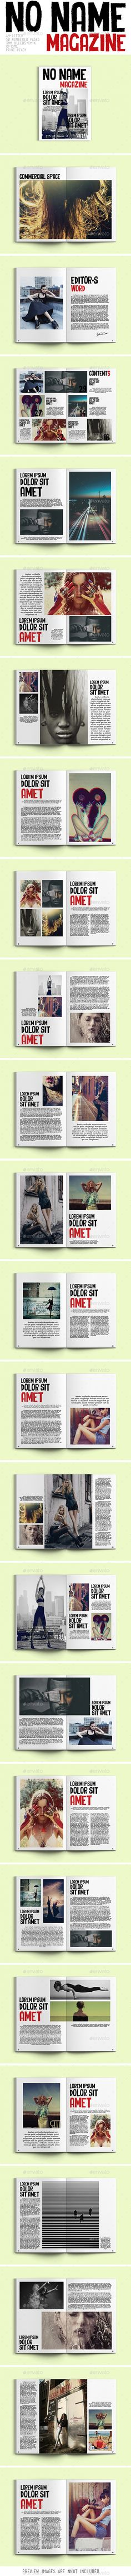 No Name Magazine Template #design #magazine Download: http://graphicriver.net/item/no-name-magazine/12002641?ref=ksioks